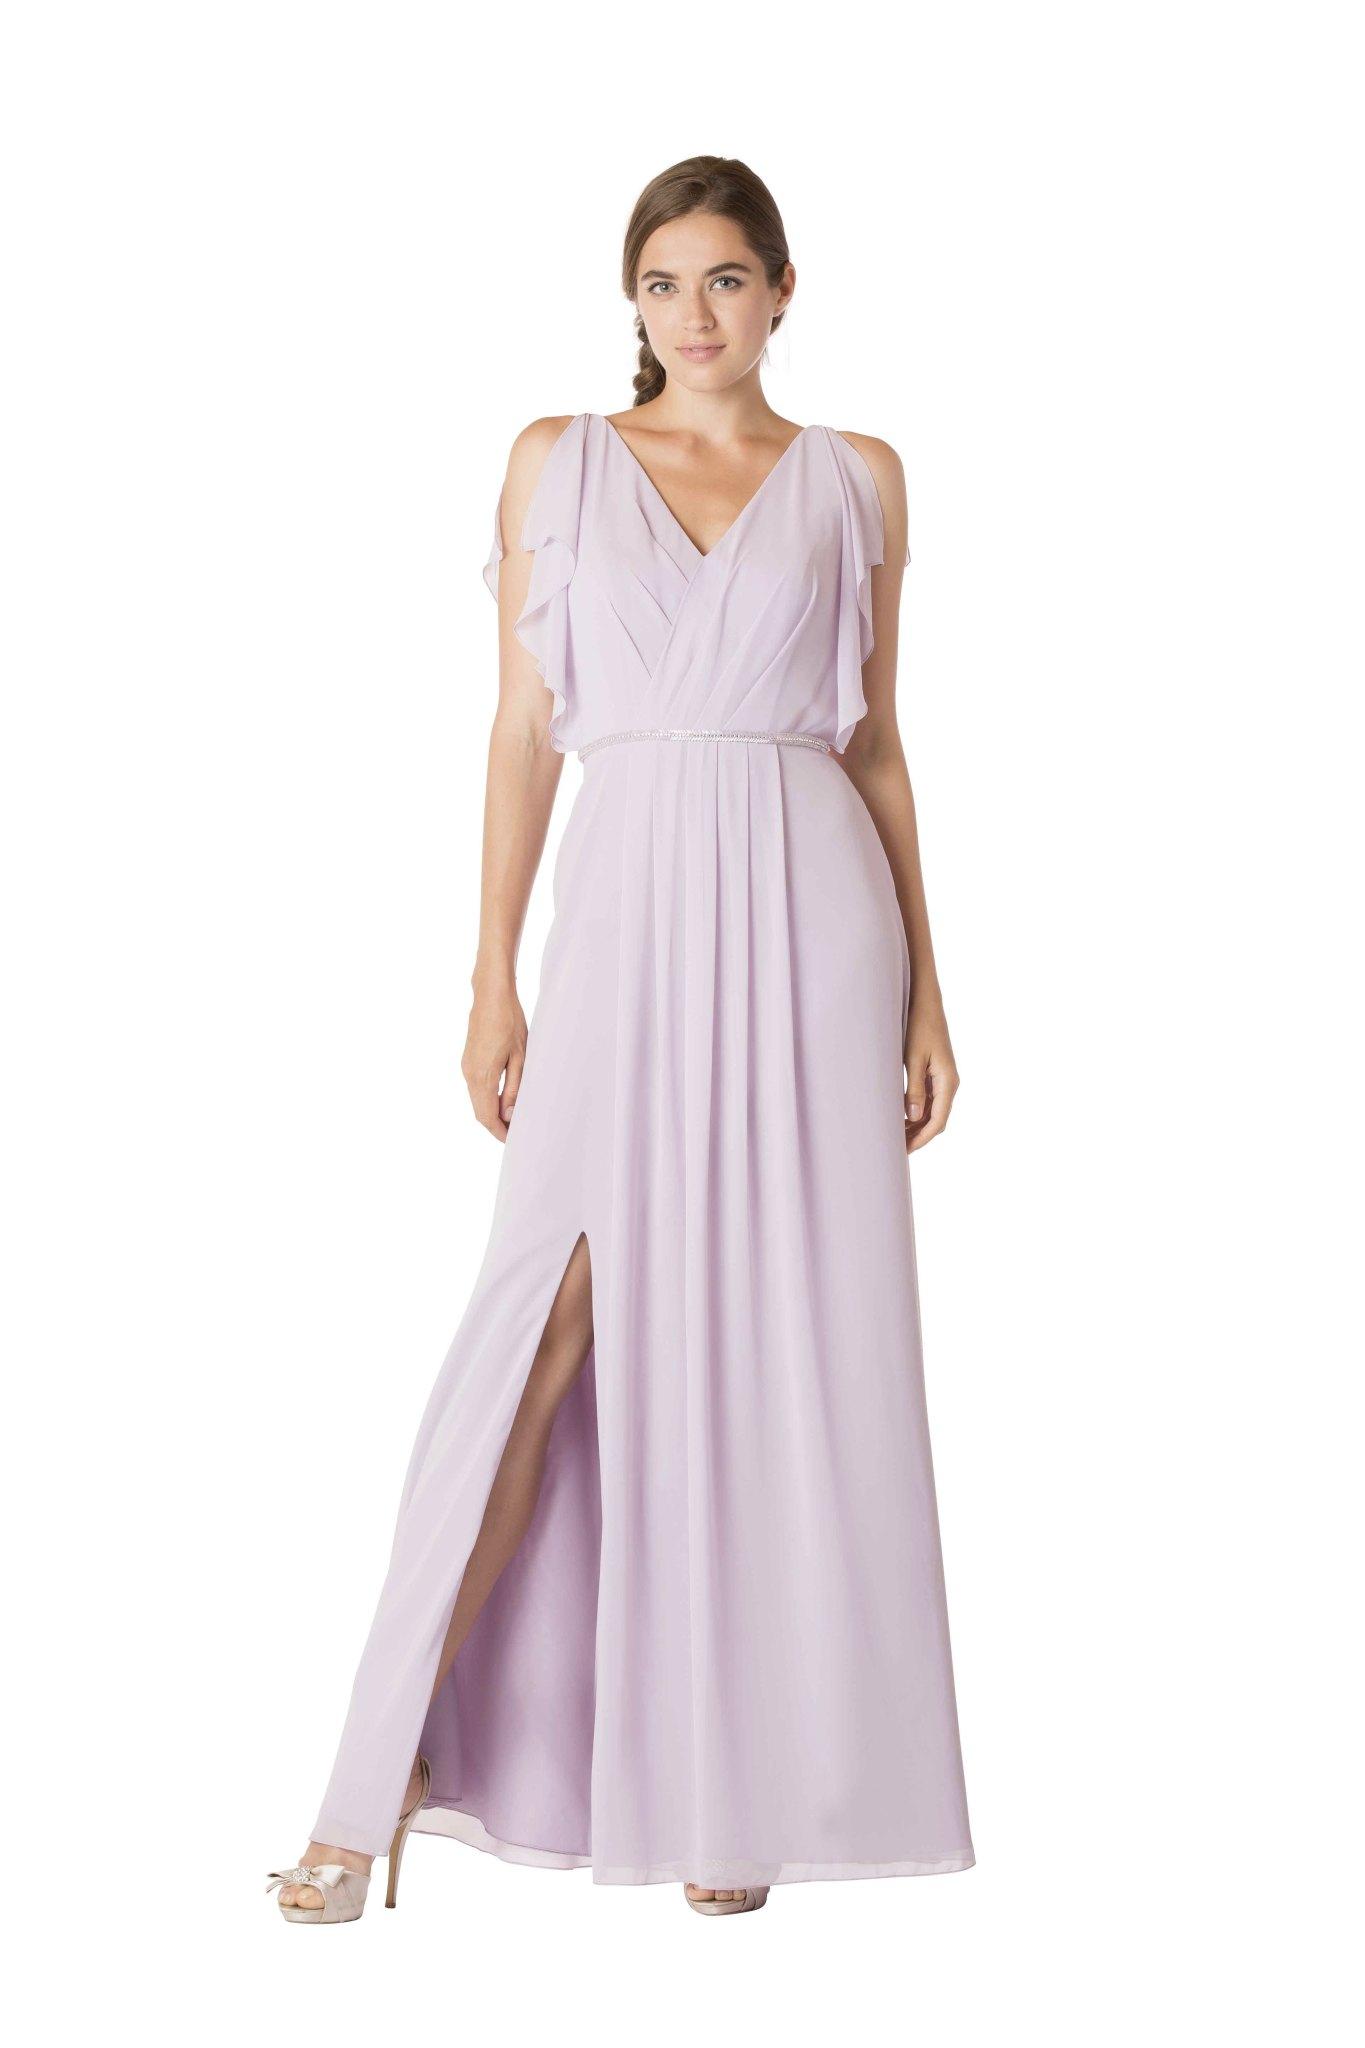 72dc82095bd 1700 bari jay bridesmaid dresses Archives ⋆ Precious Memories ...